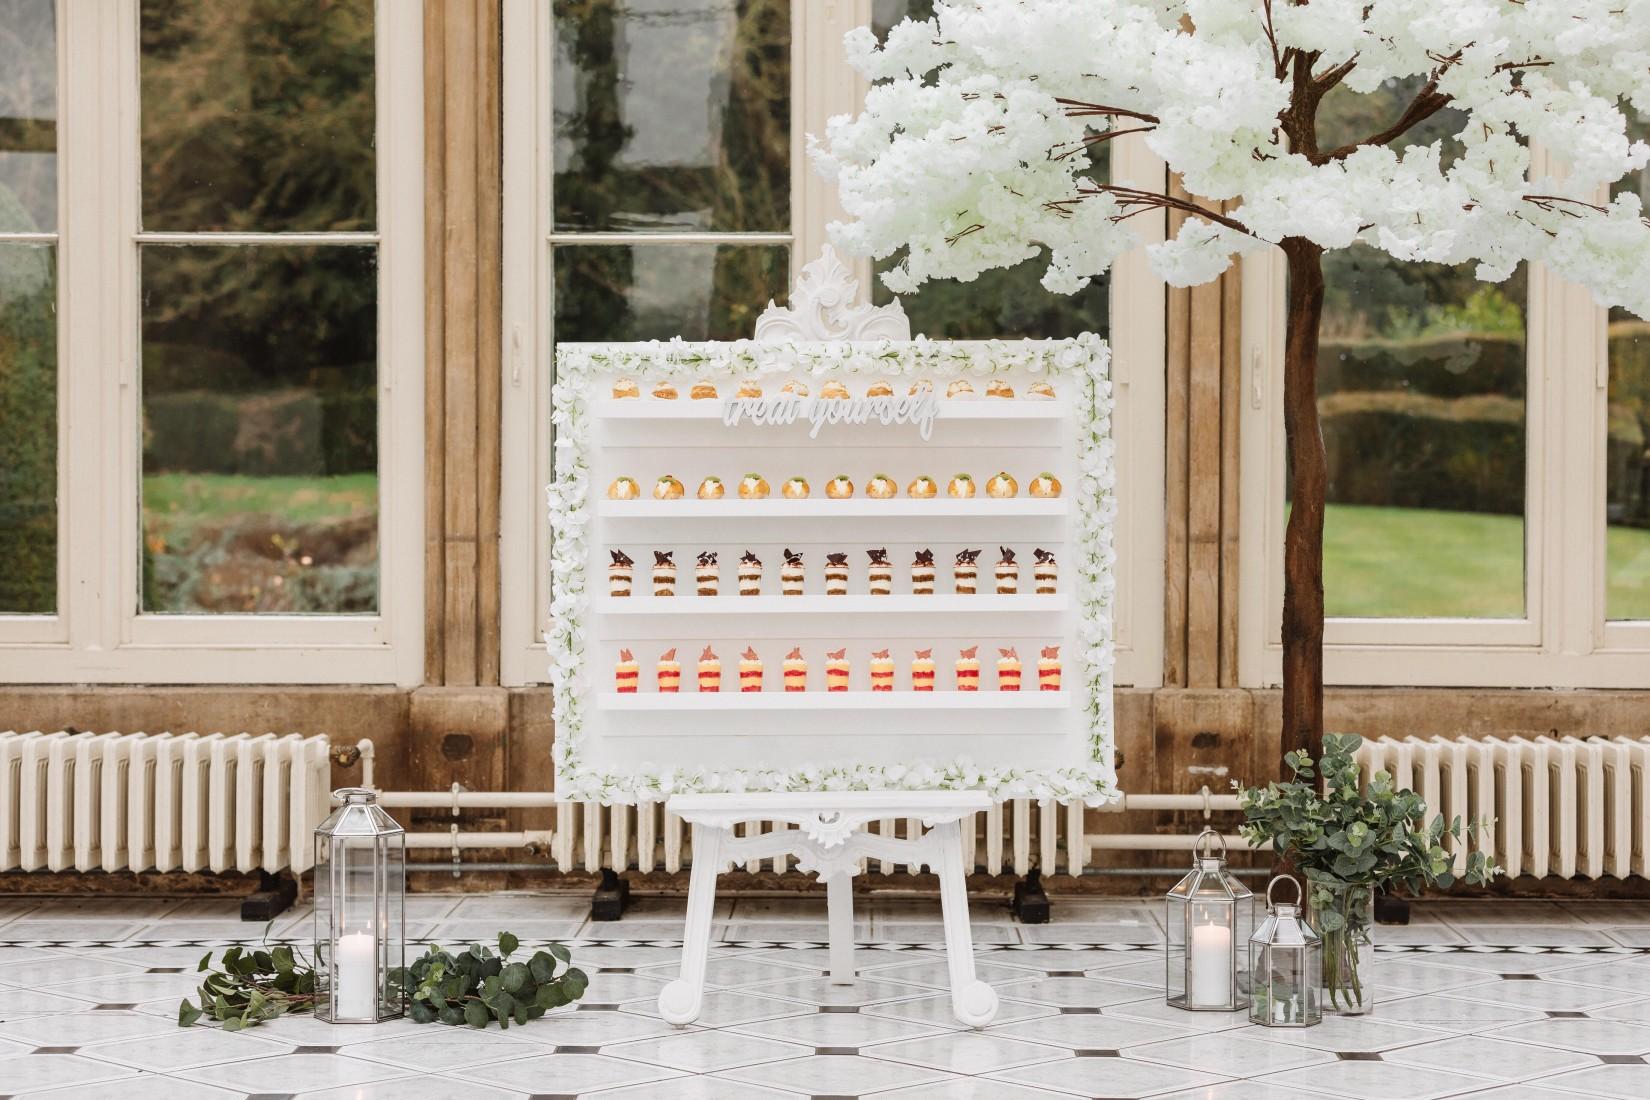 Pasticerria Lorena - Italian wedding cakes - Italian dessert table - alternative wedding cakes 1